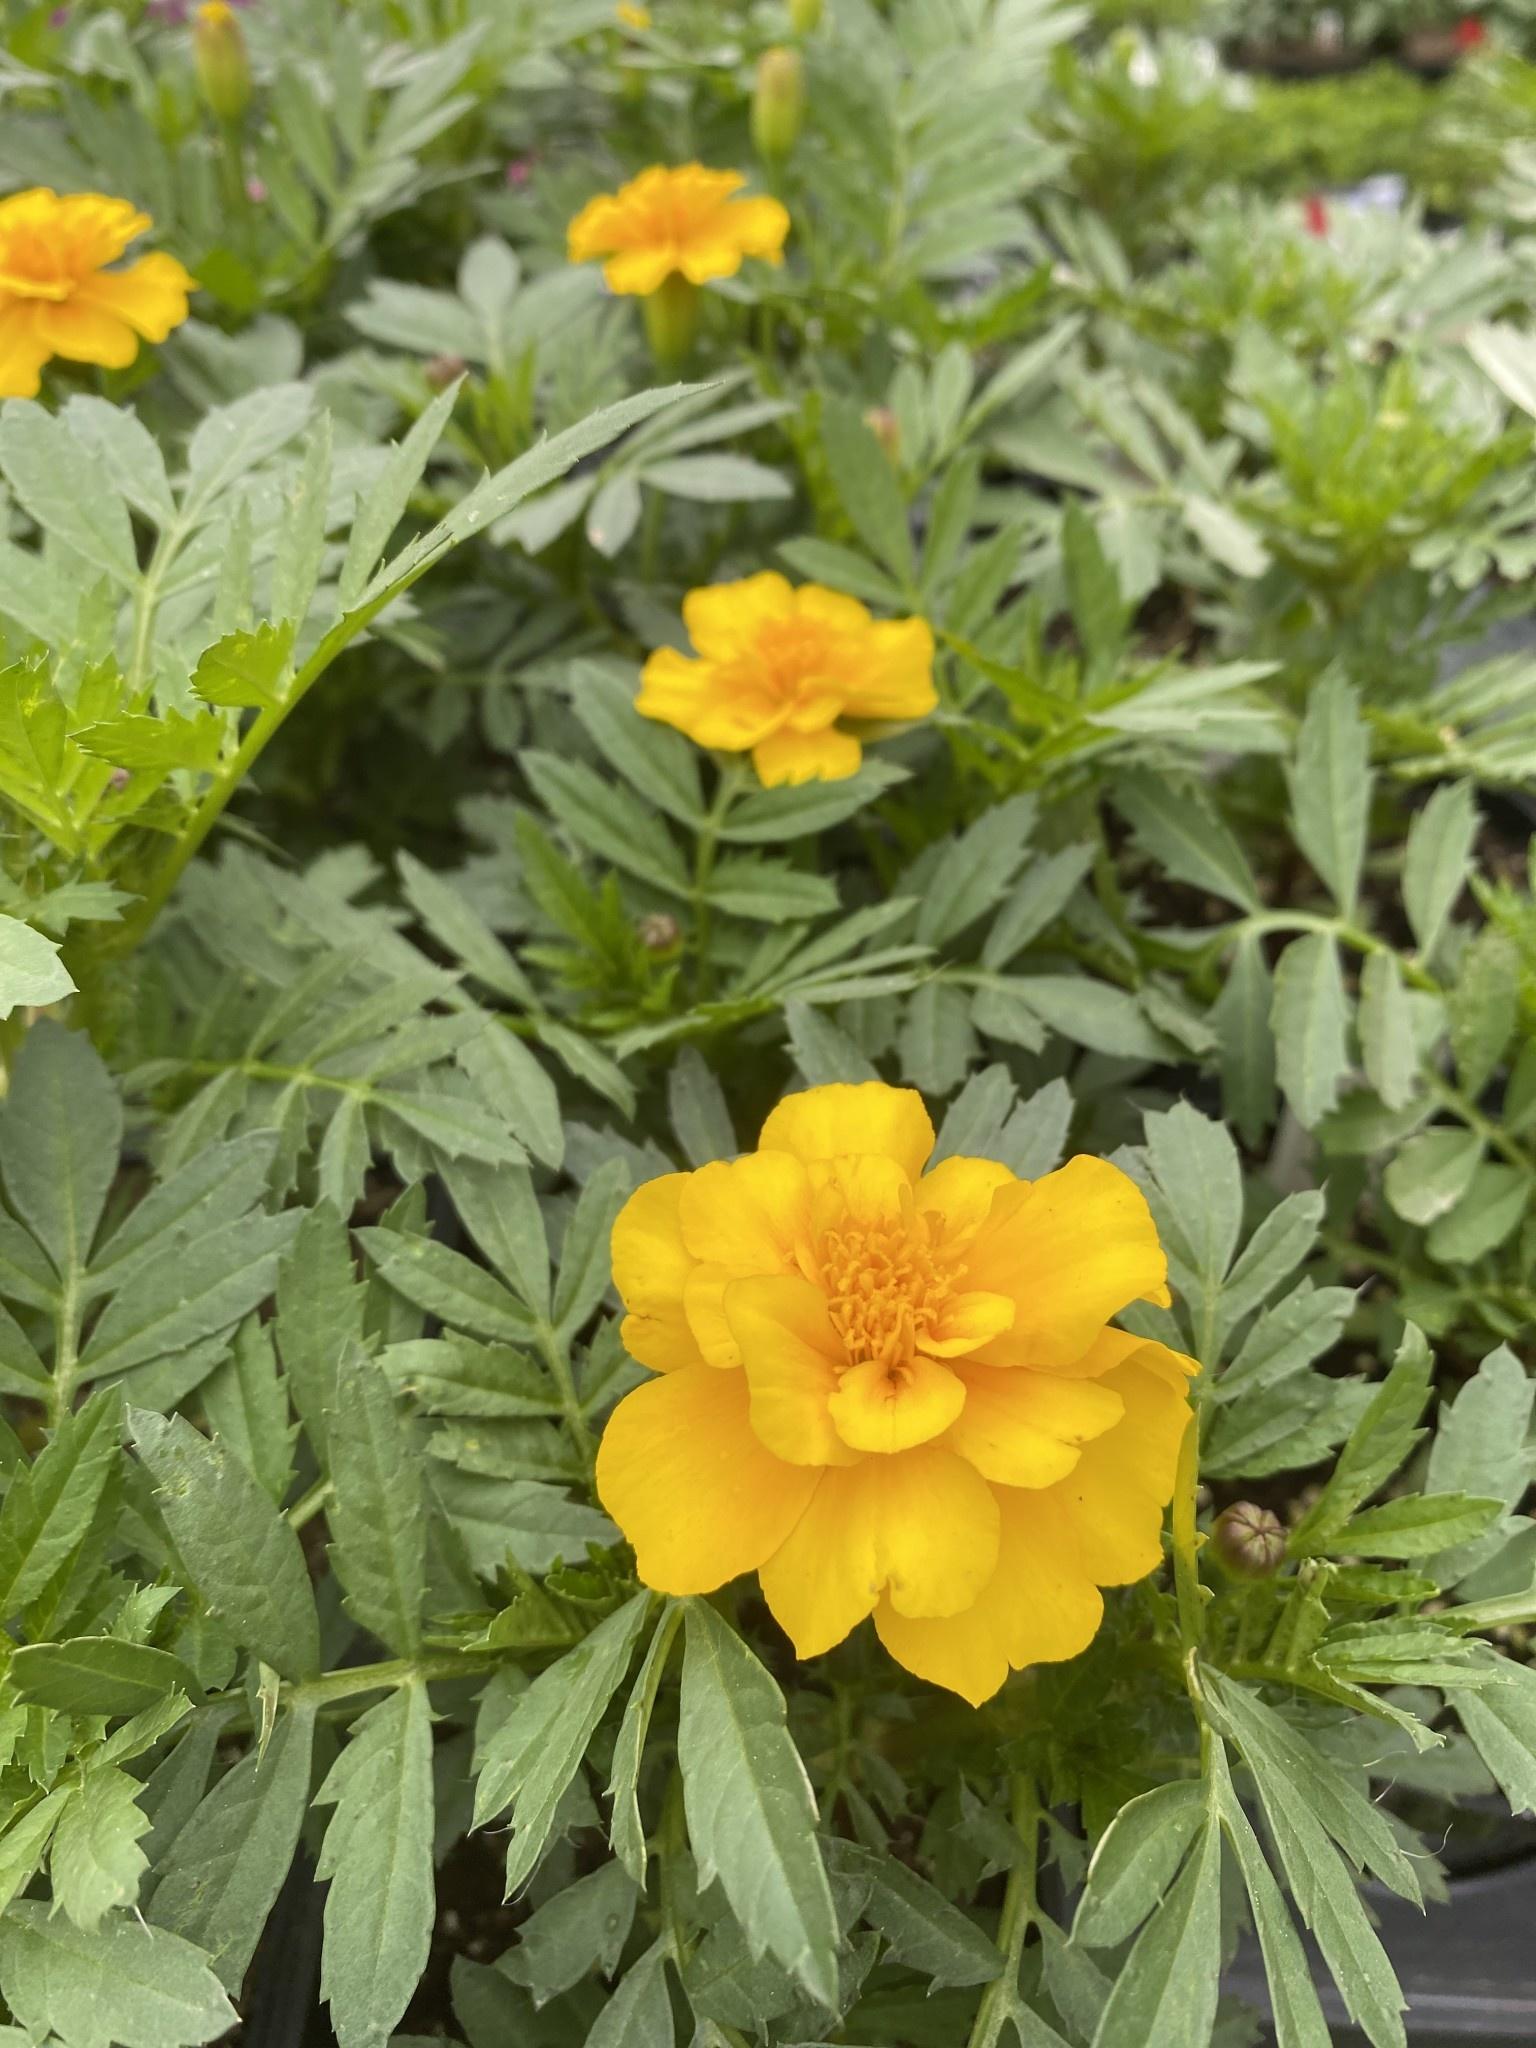 Marigold, Durango Yellow